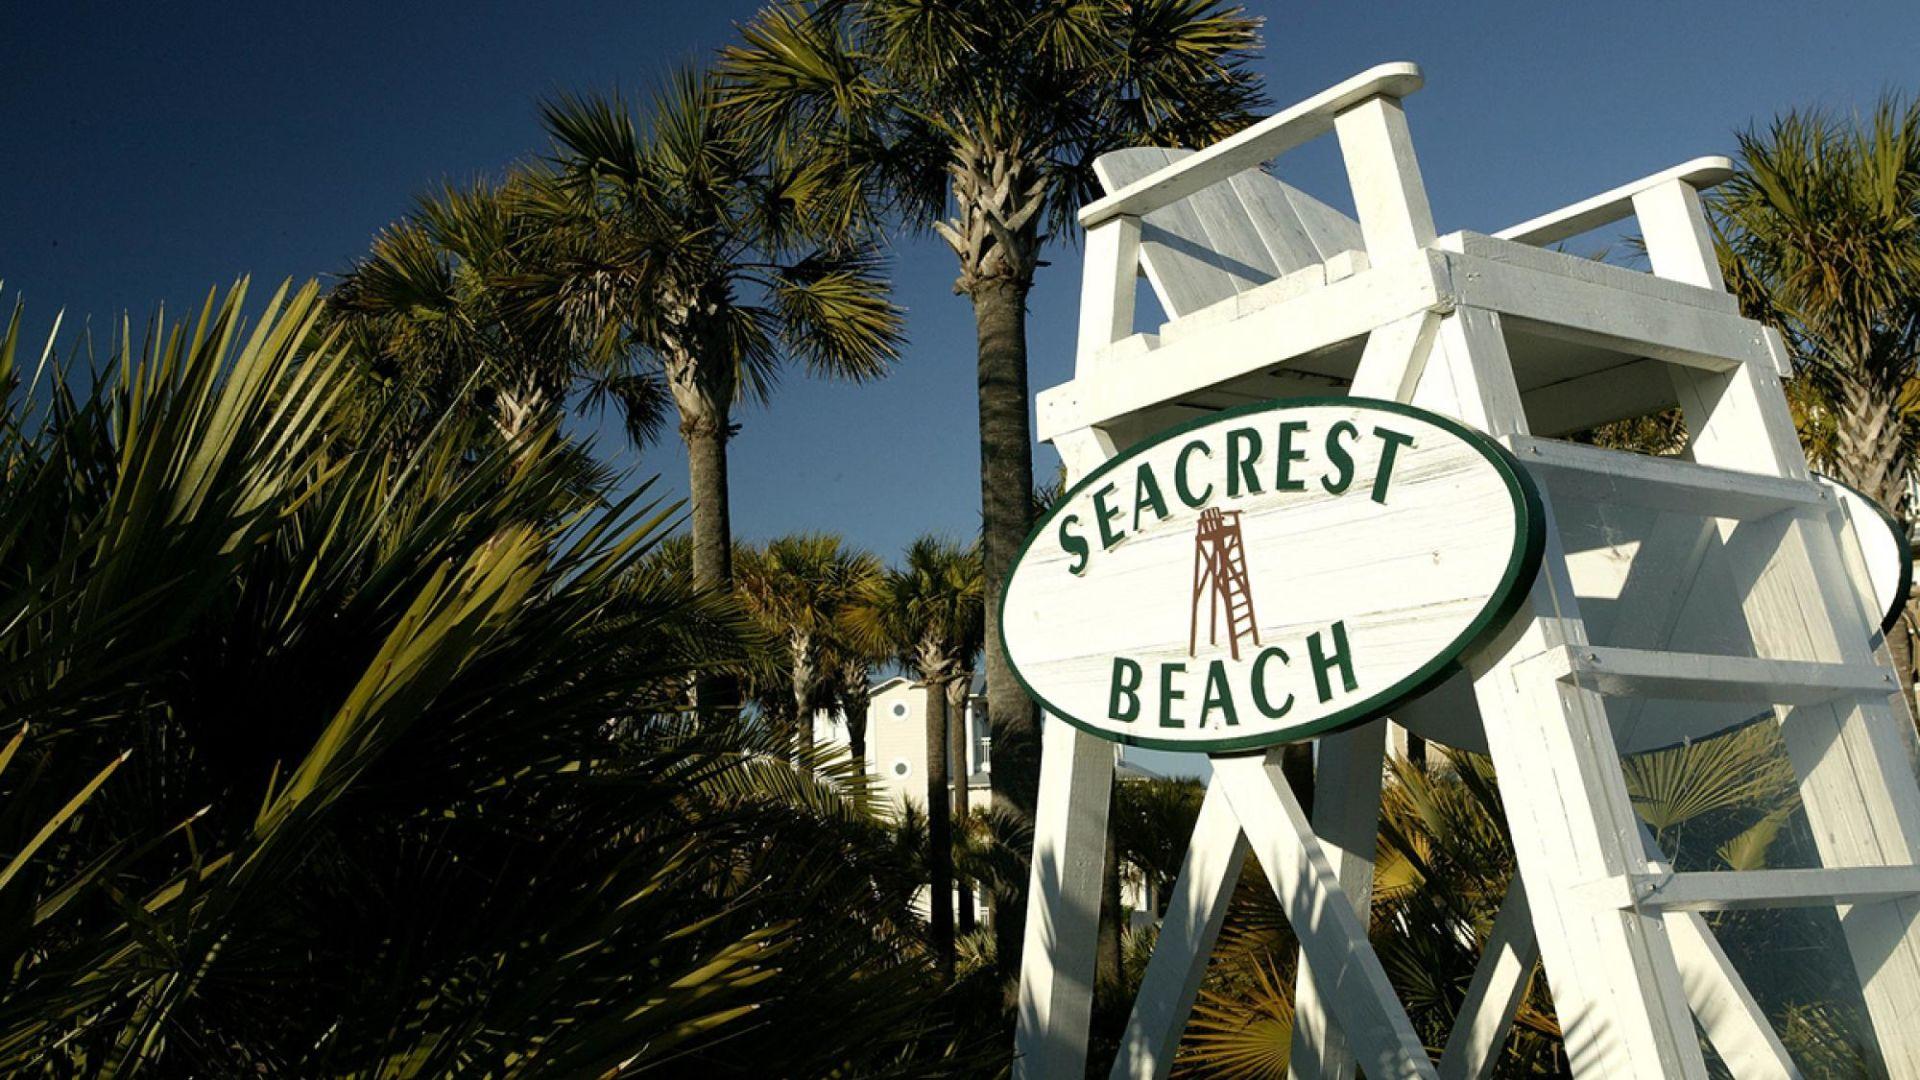 Summer Vacation at Seacrest